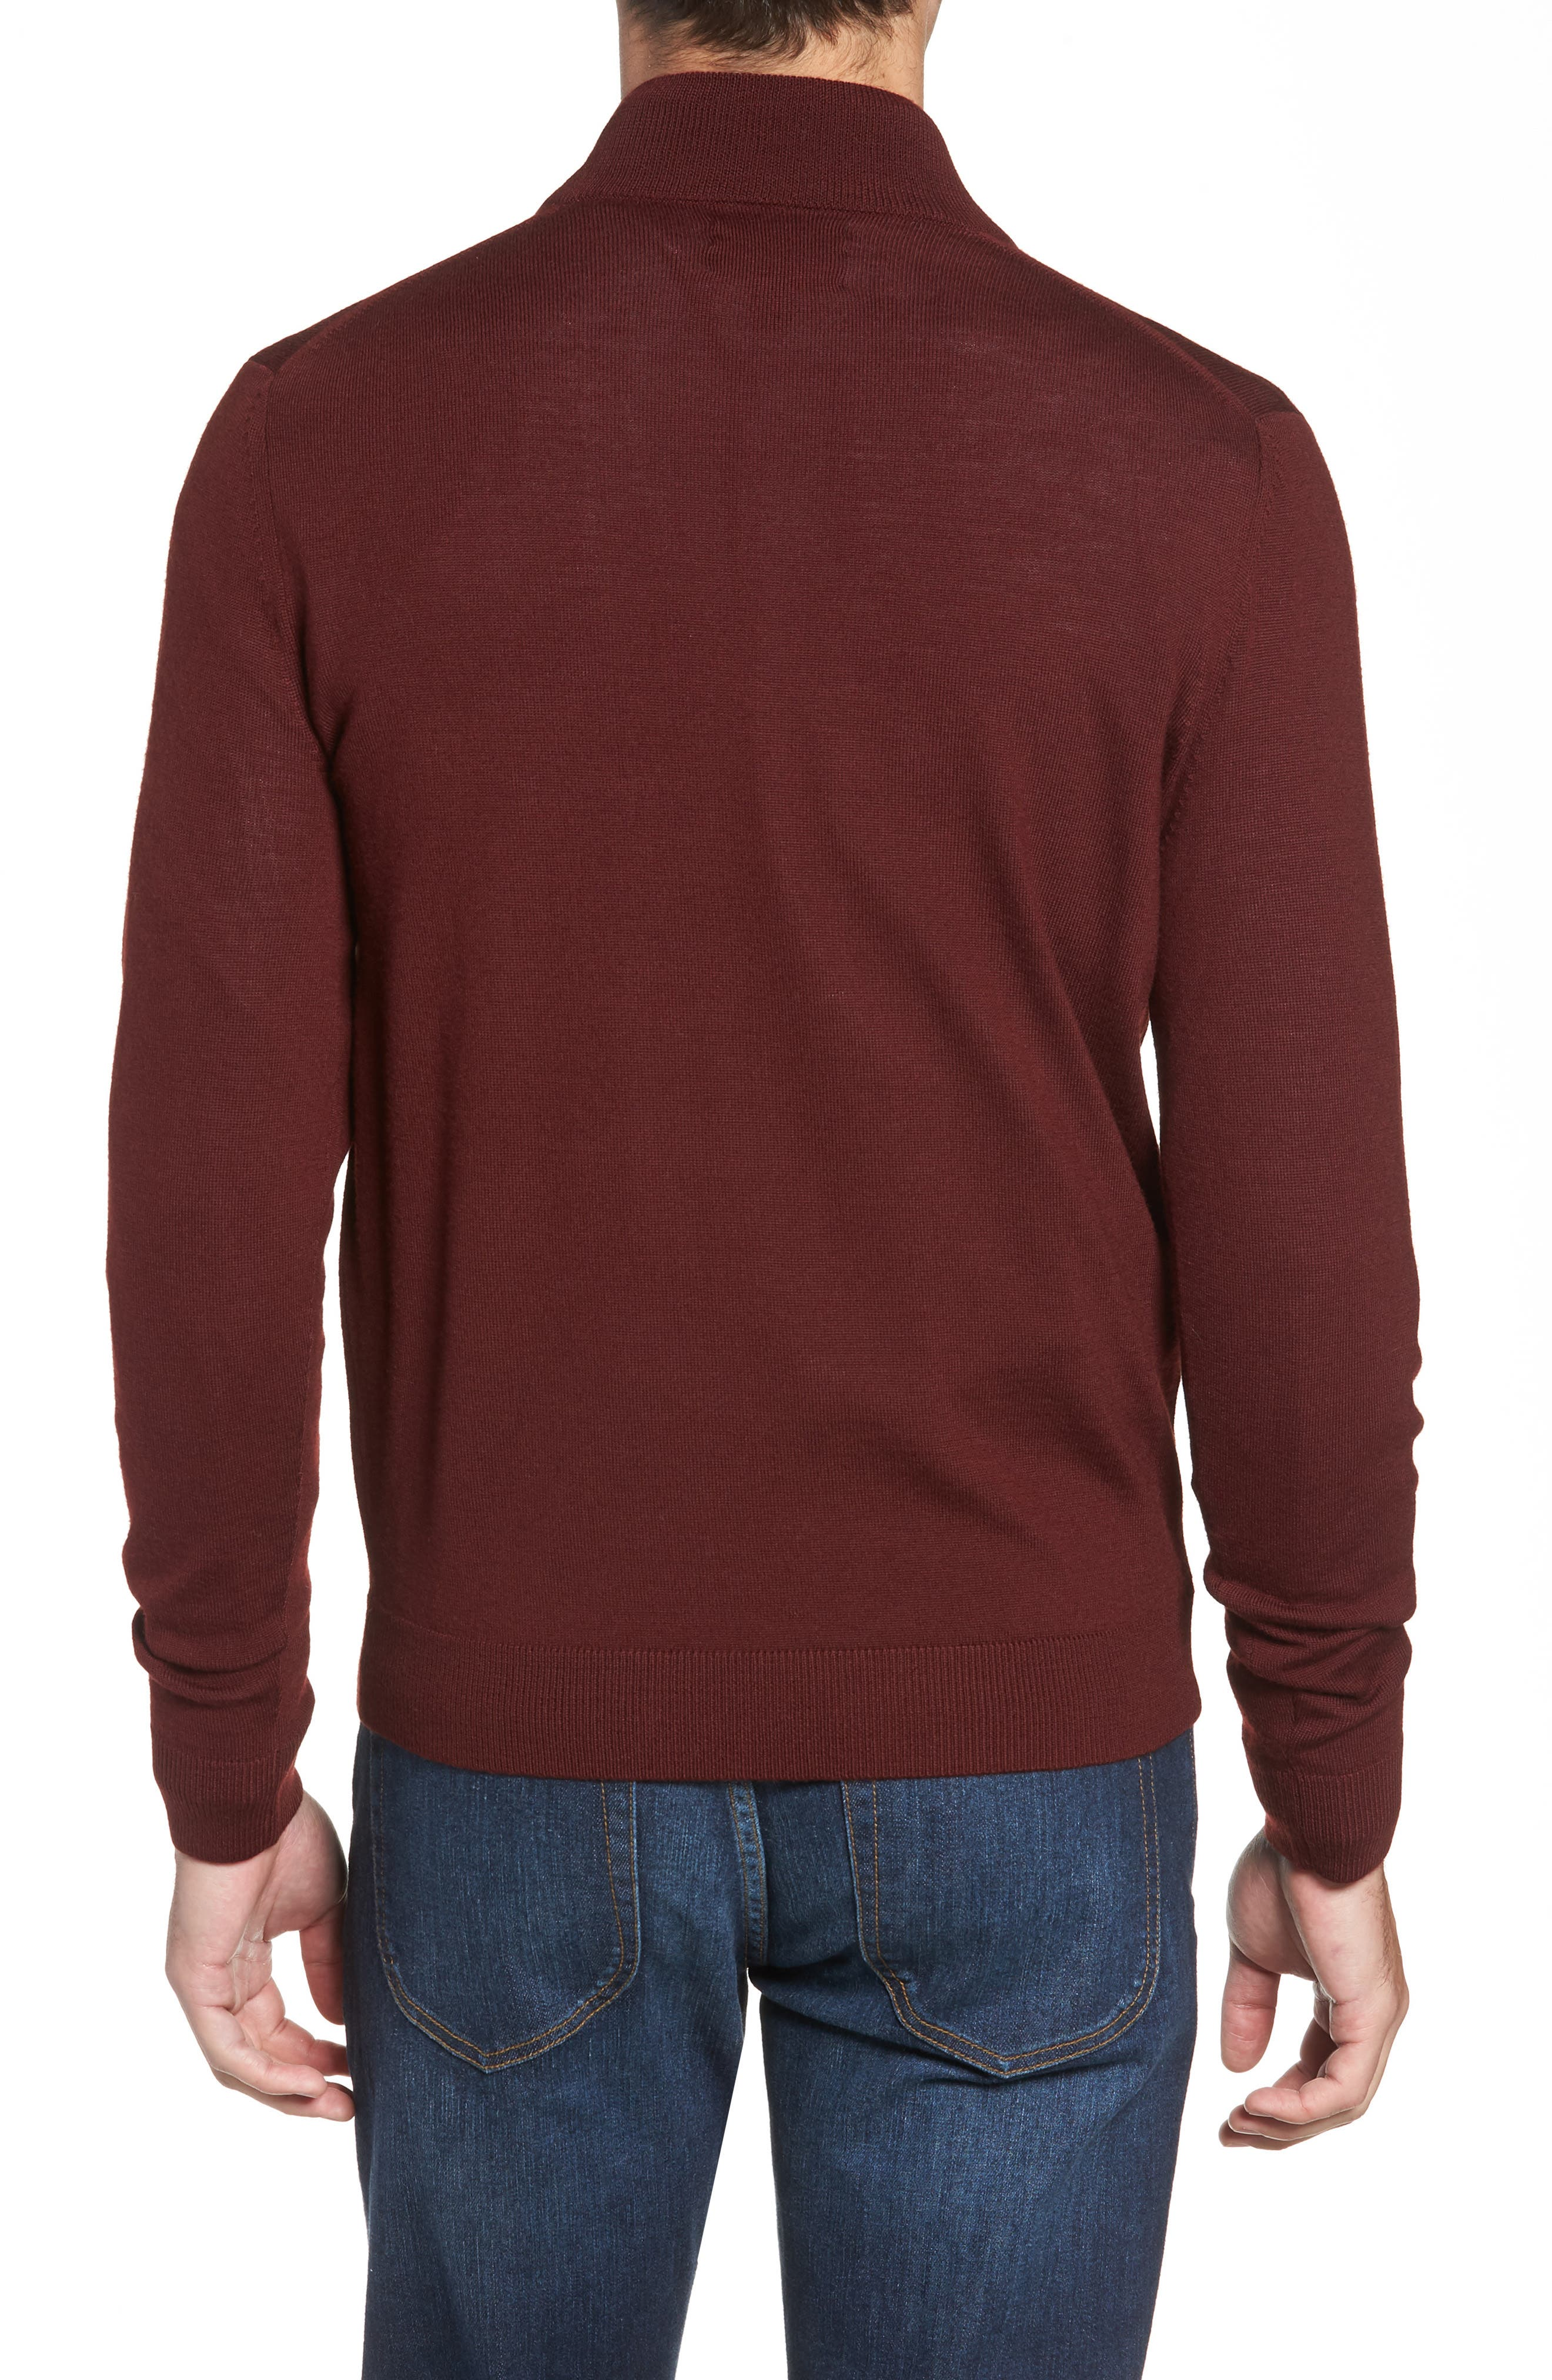 Quarter Zip Wool Pullover,                             Alternate thumbnail 2, color,                             BURGUNDY ROYALE